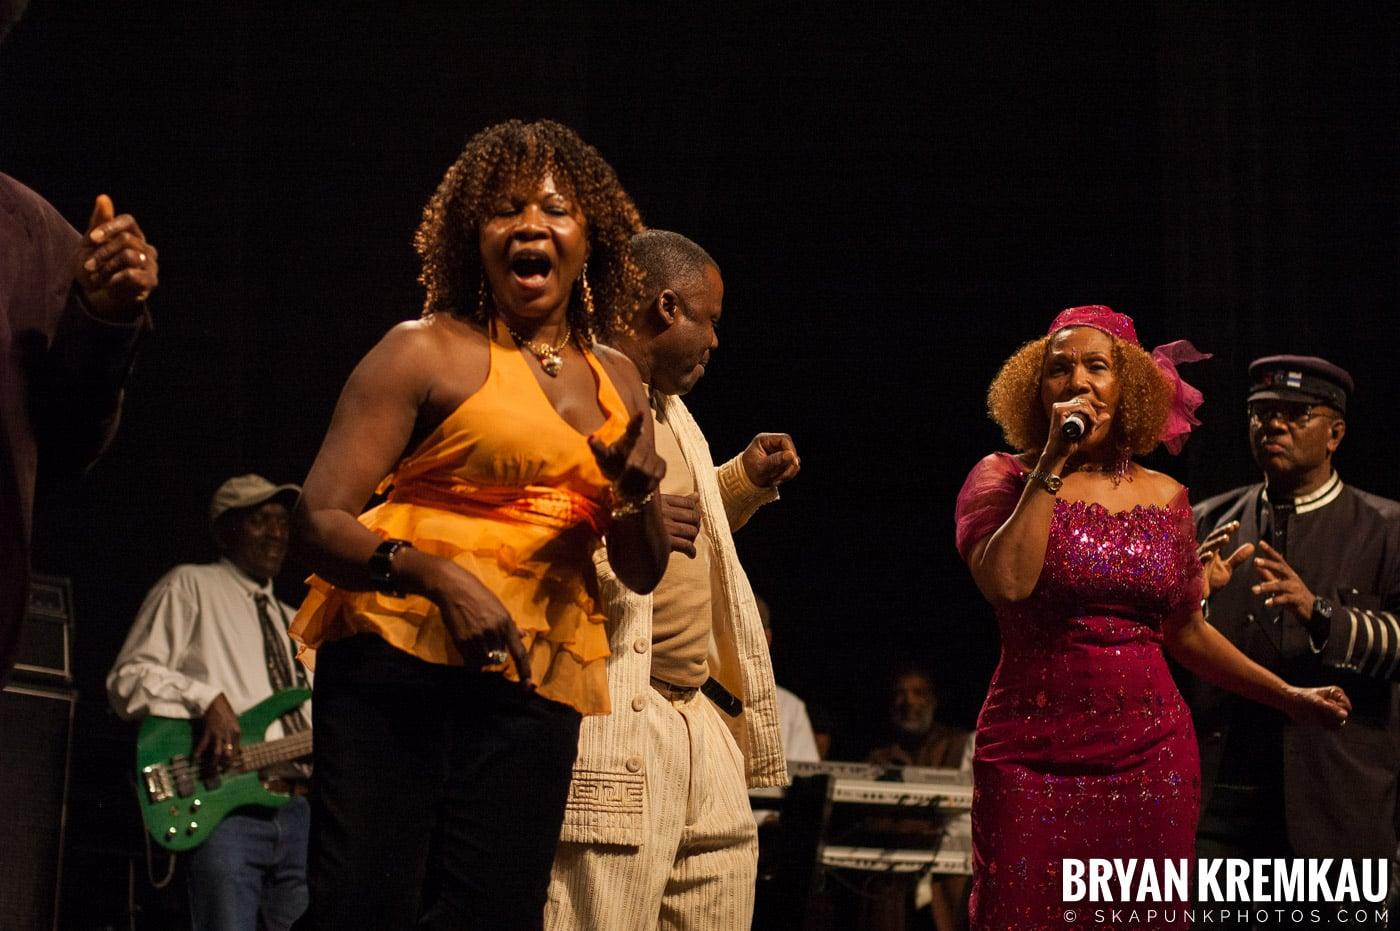 Marcia Griffiths @ Vintage Reggae Fest - Hammerstein Ballroom, NYC - 12.16.2007 (1)